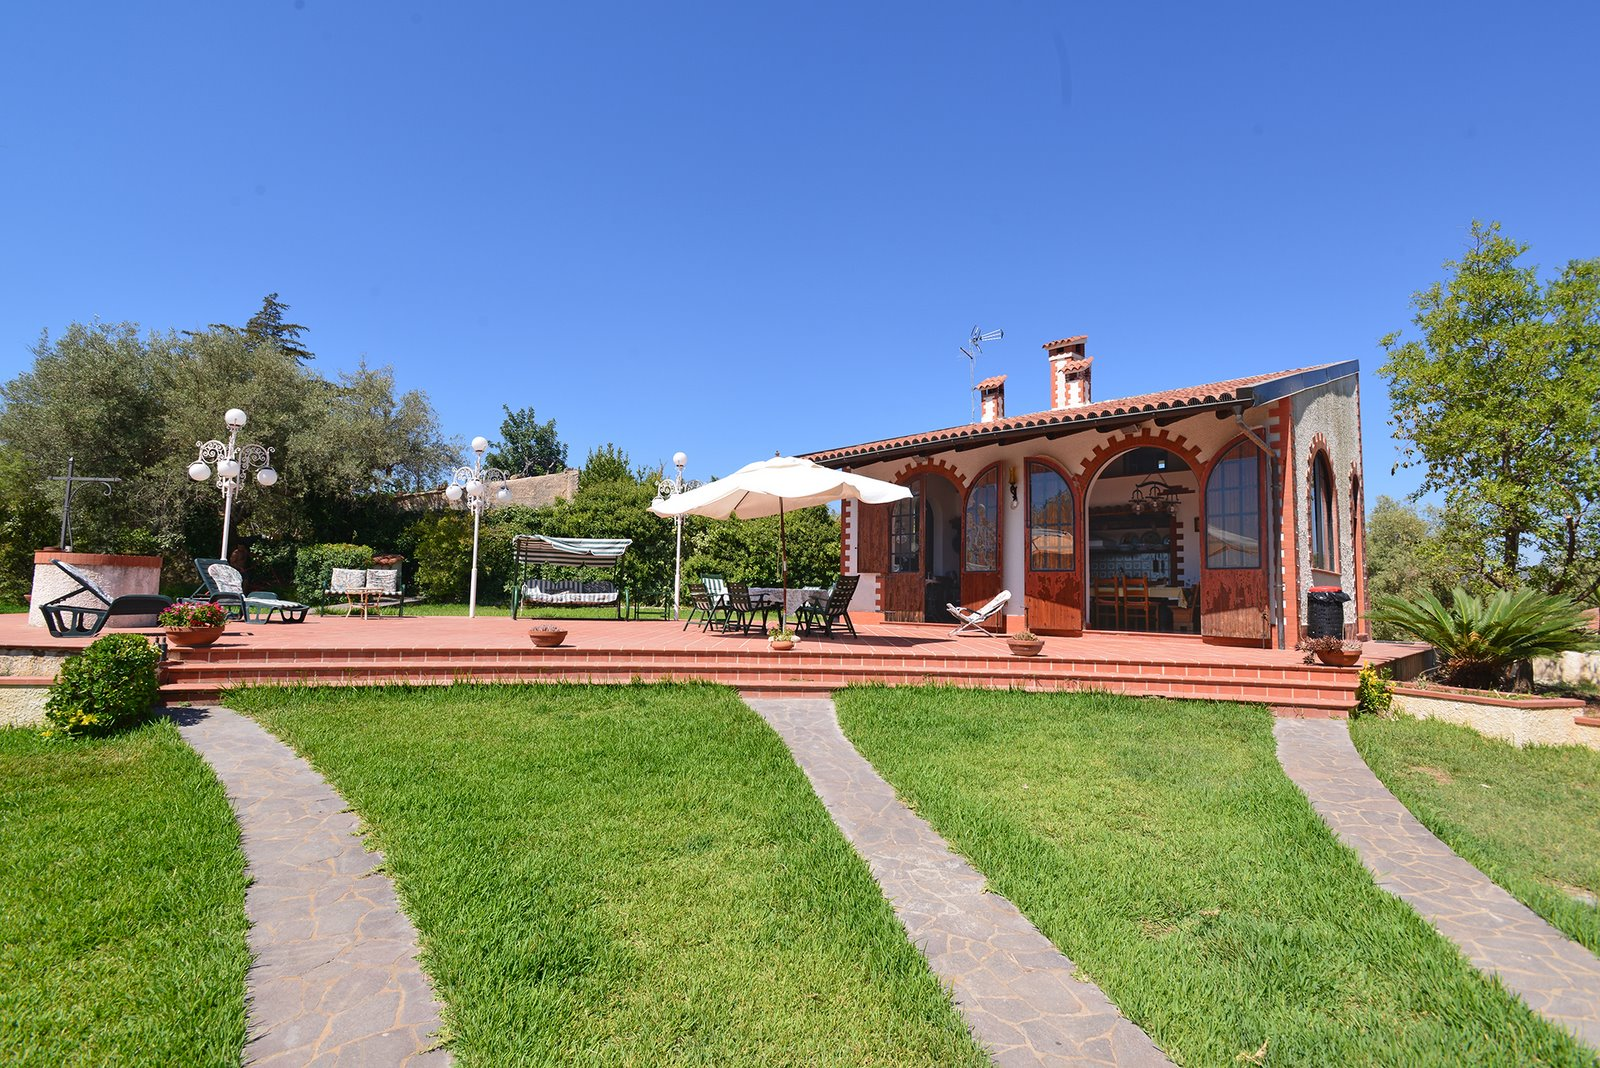 Maison de vacances Villa Casa (1531407), Solarino, Siracusa, Sicile, Italie, image 15